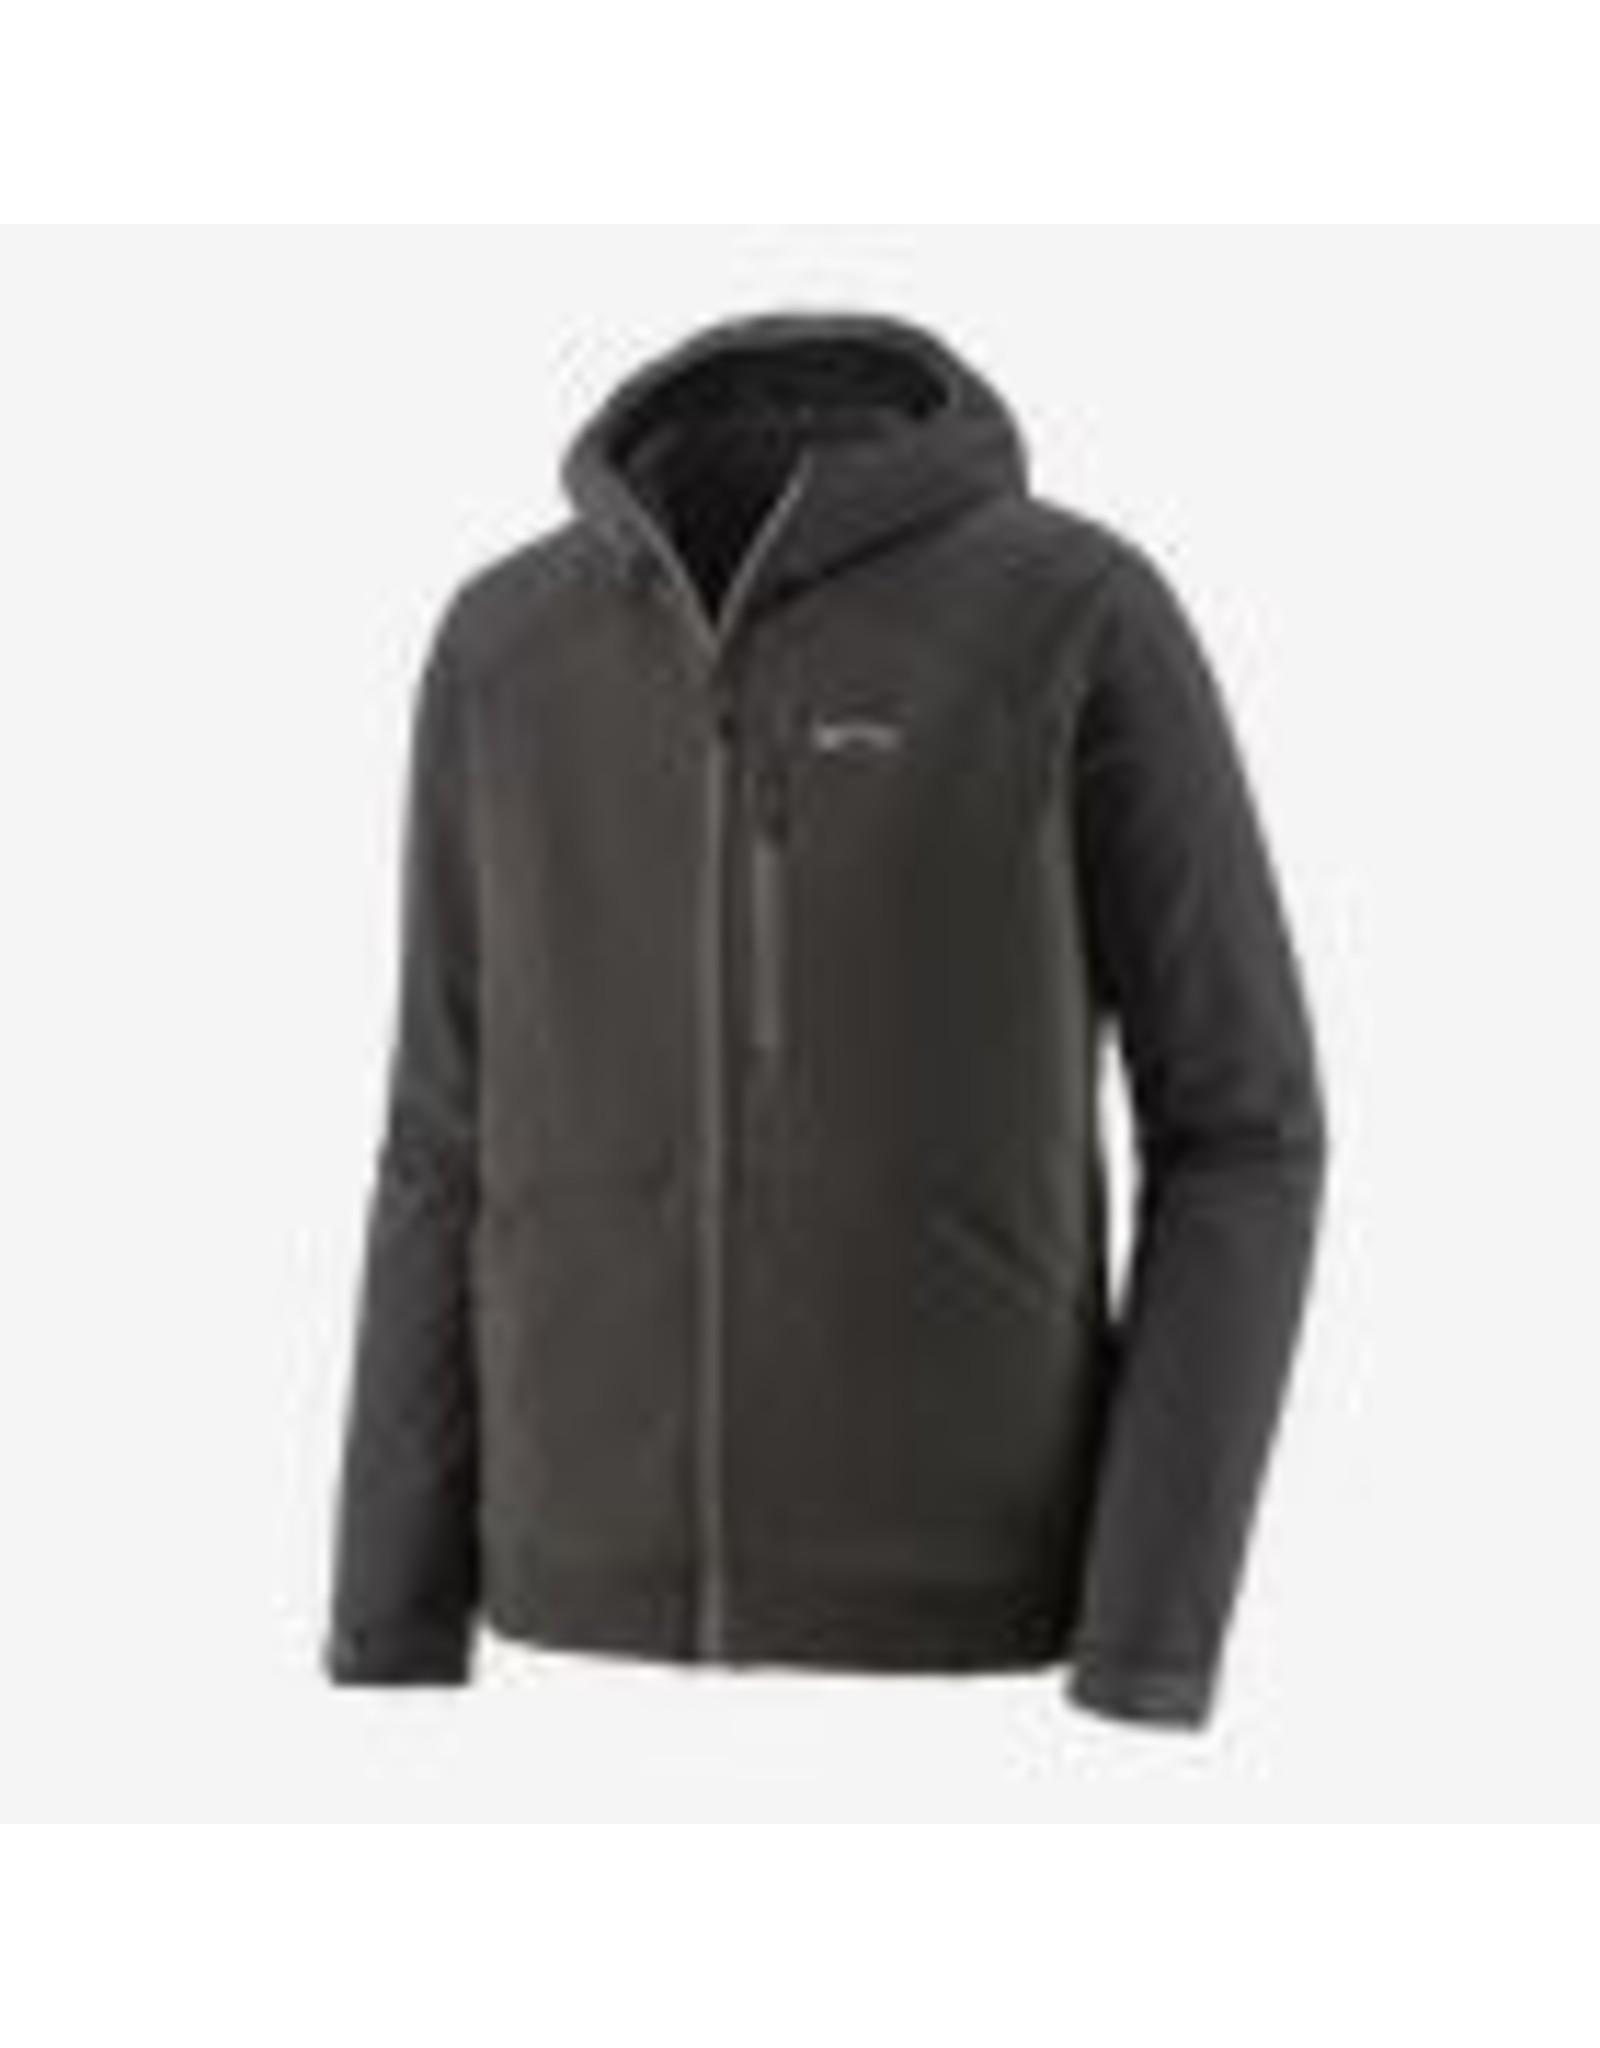 Patagonia Patagonia - Men's Snap-Dry Hoody